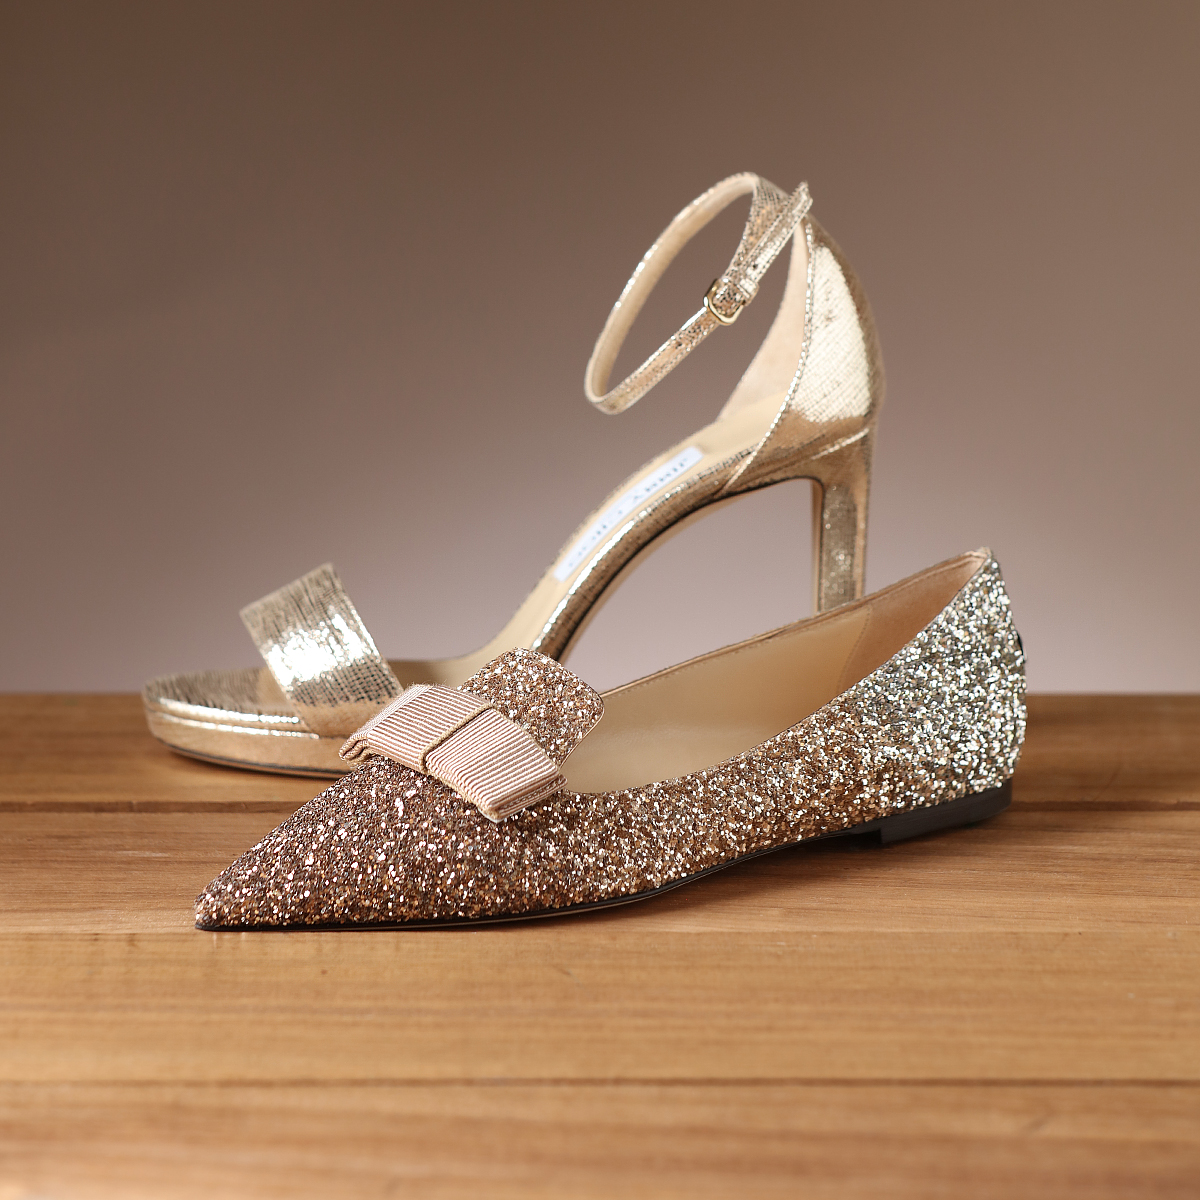 Jimmy Choo Womens Shoes